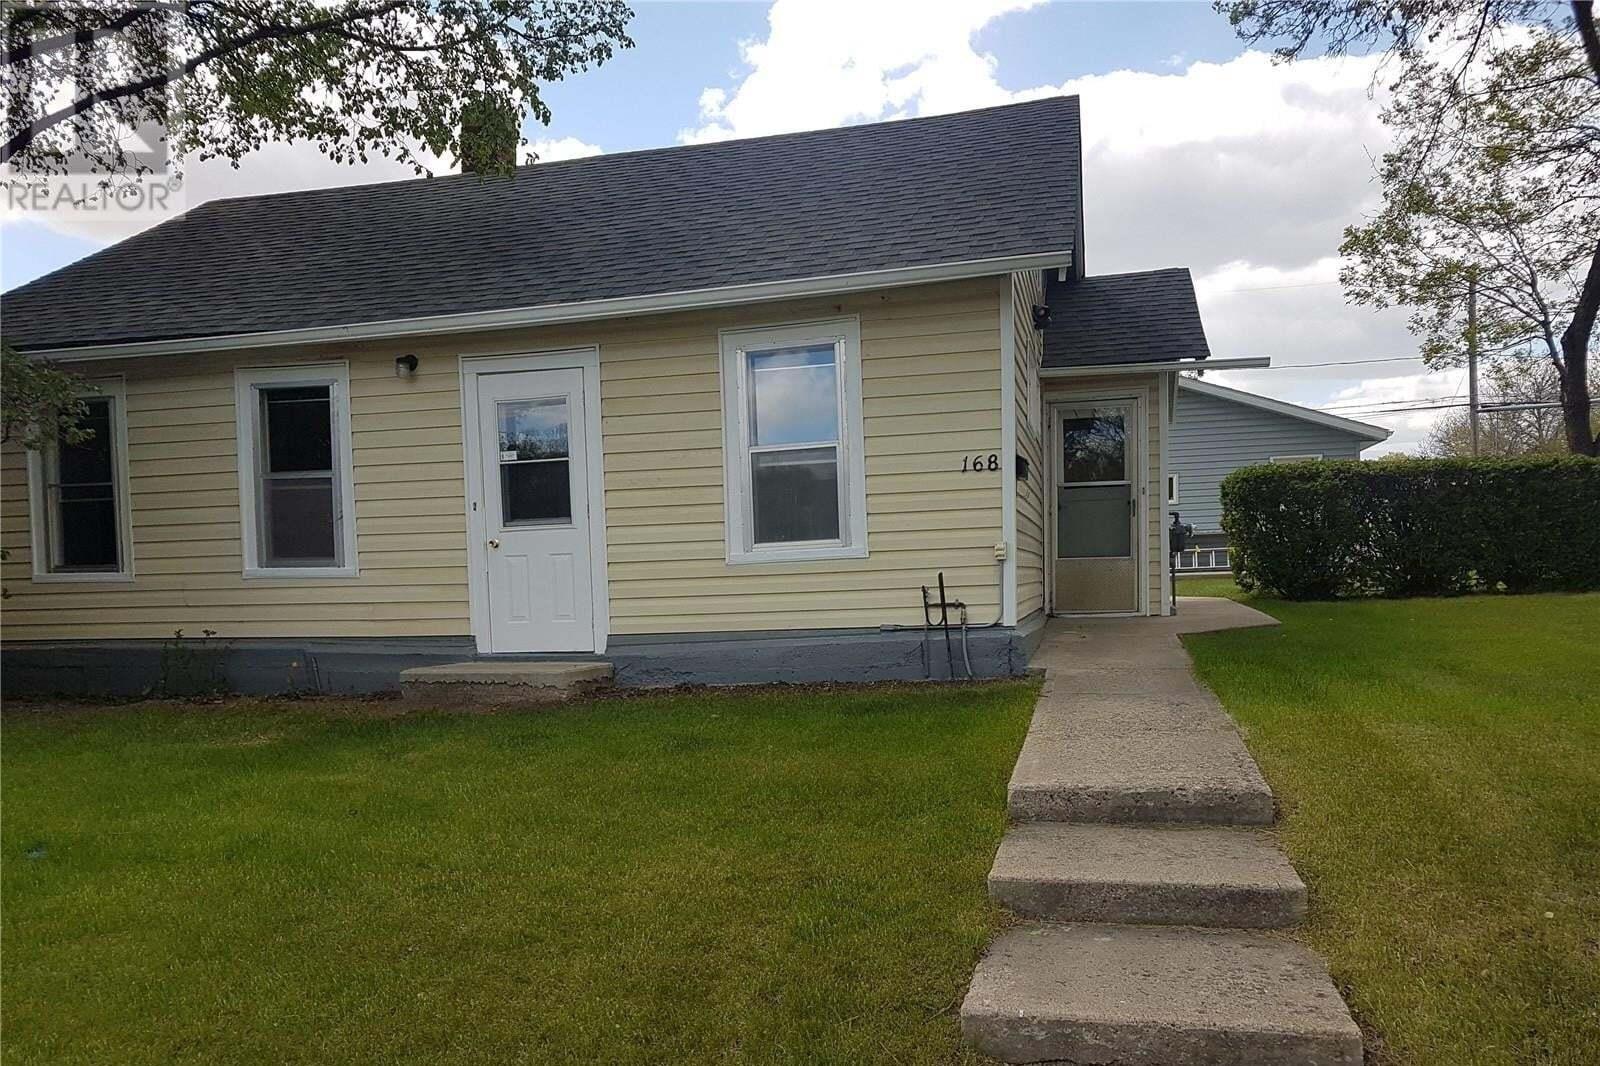 House for sale at 168 4th Ave SE Swift Current Saskatchewan - MLS: SK810173